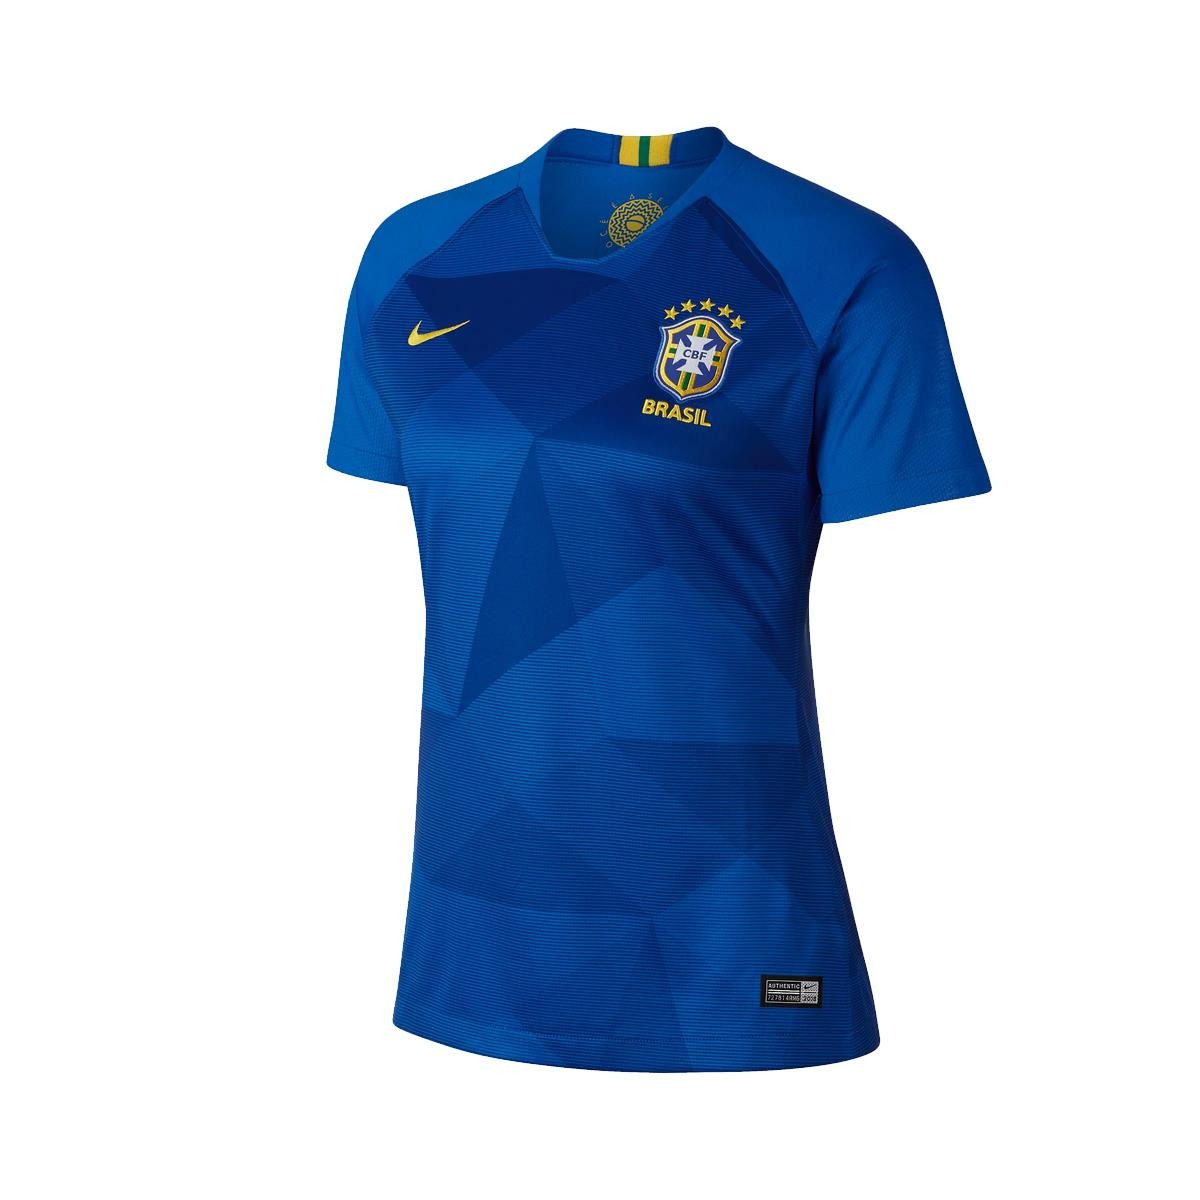 camisa nike brasil ii 2018 19 torcedora feminina p. Carregando zoom. ab82255191347